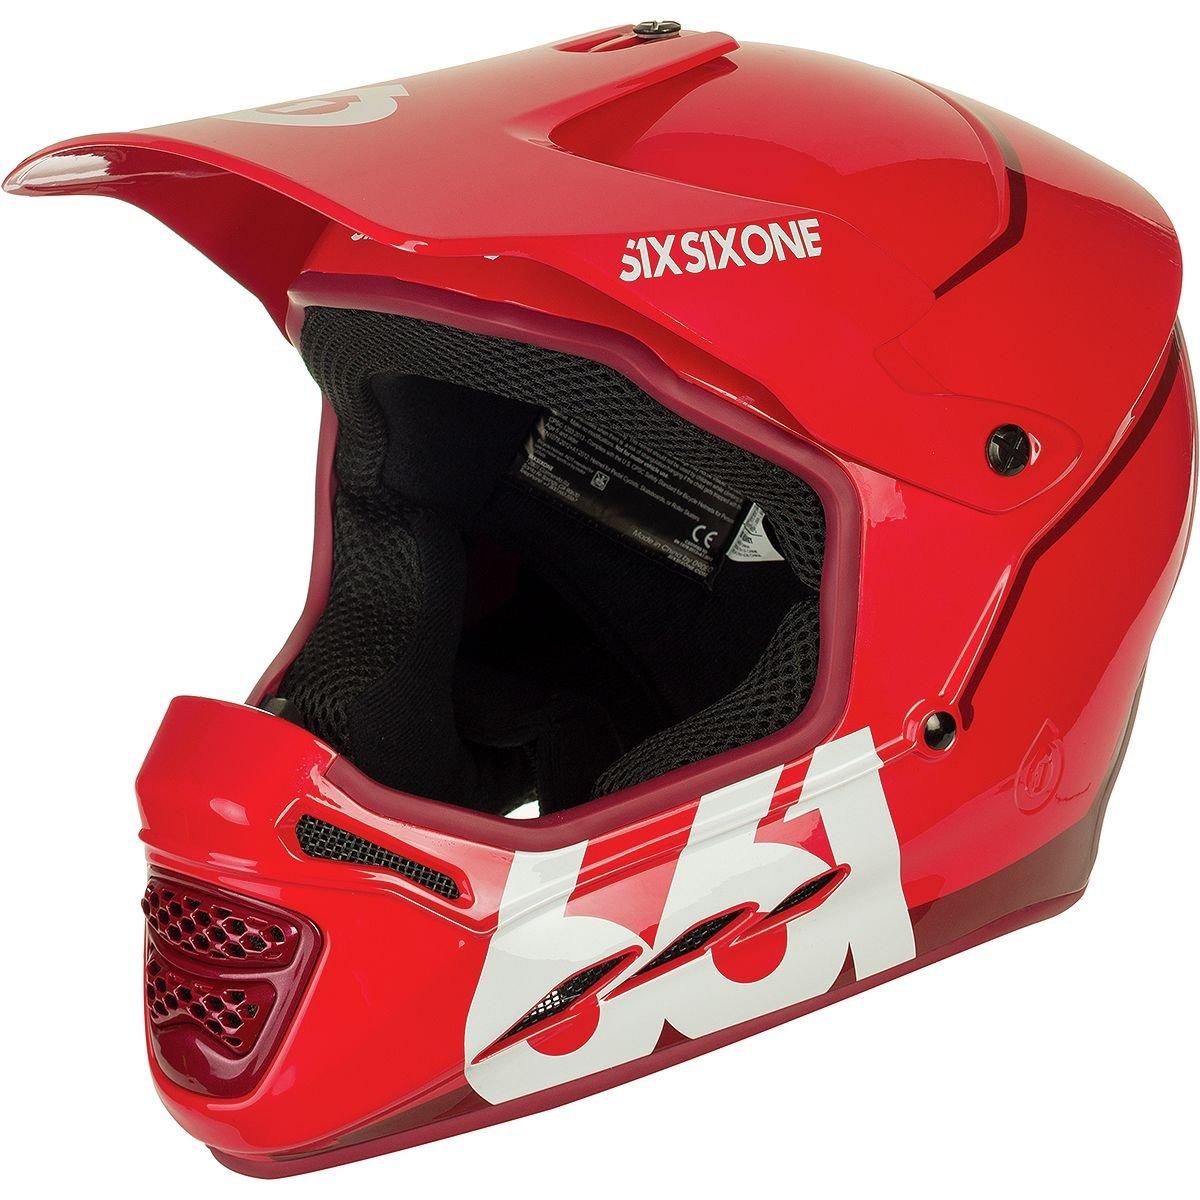 SixSixOne Tundra White 2018 Reset MTB Full Face Helmet Six Six One